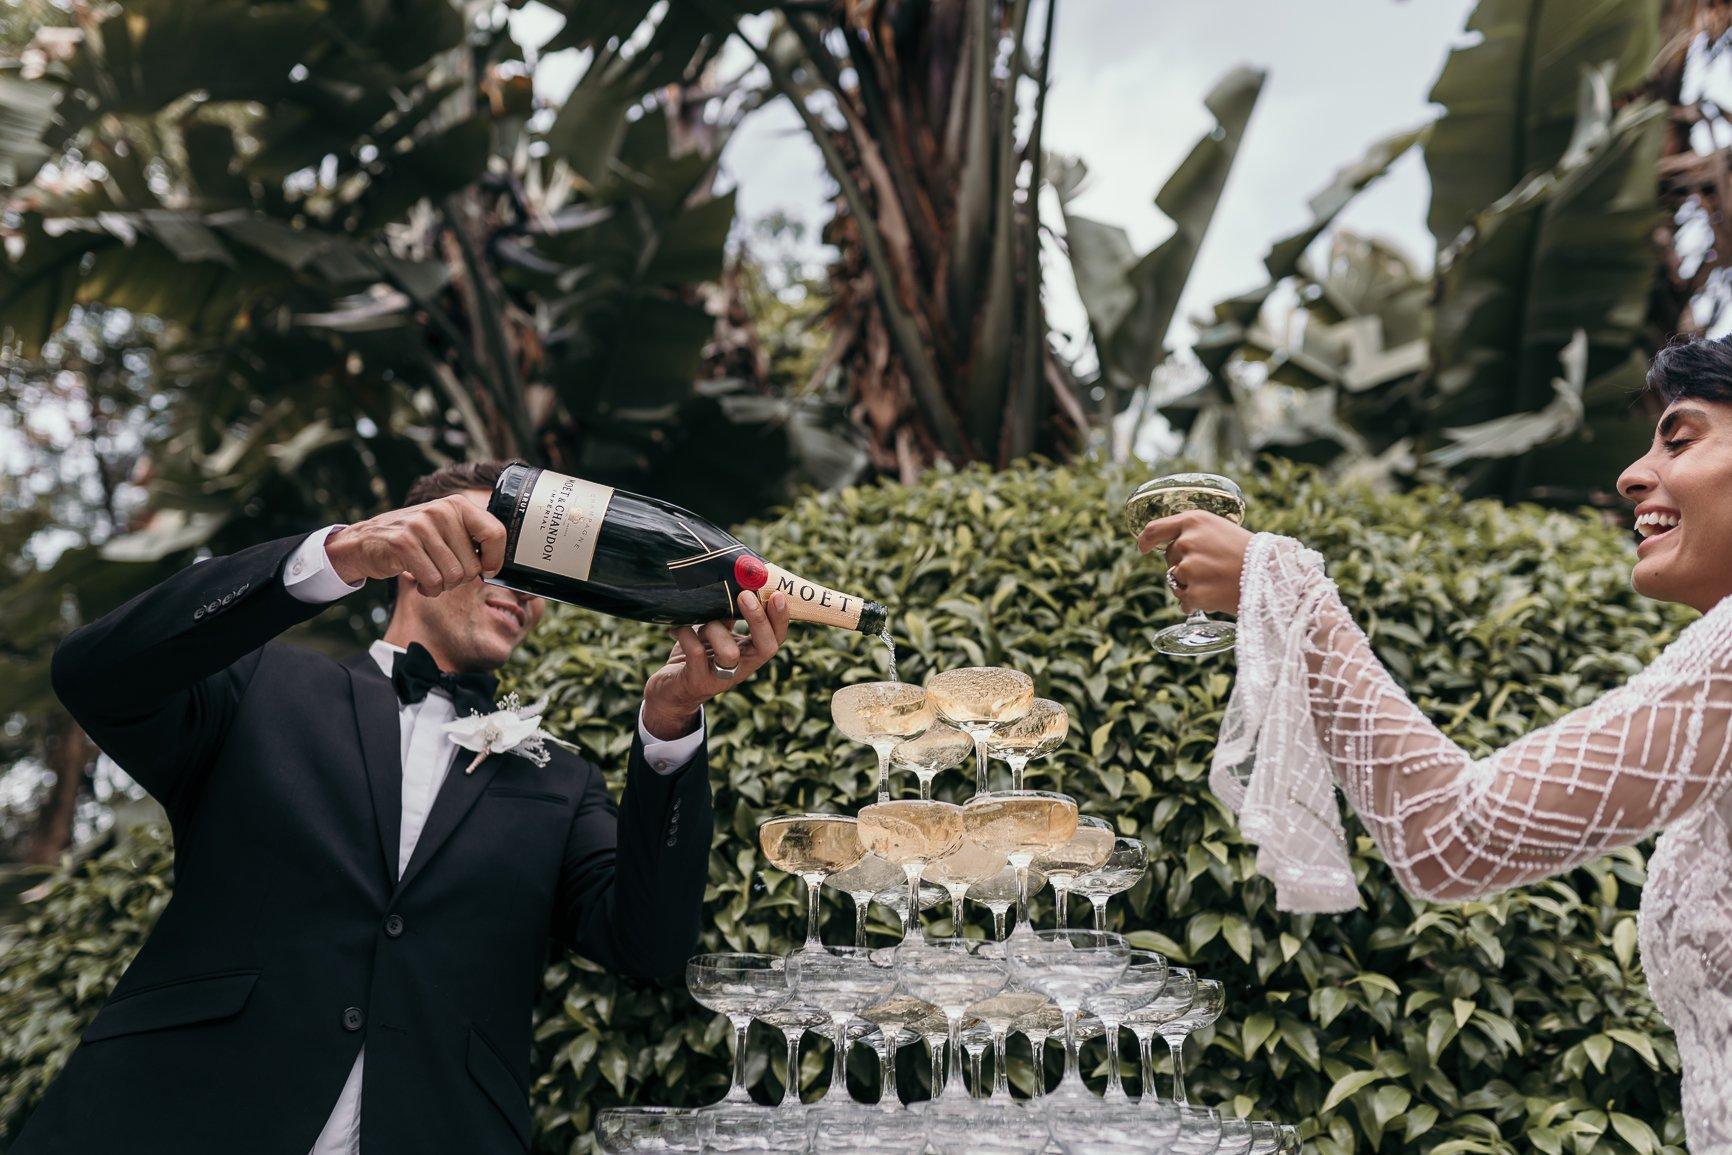 Moet Champagne Pyramid